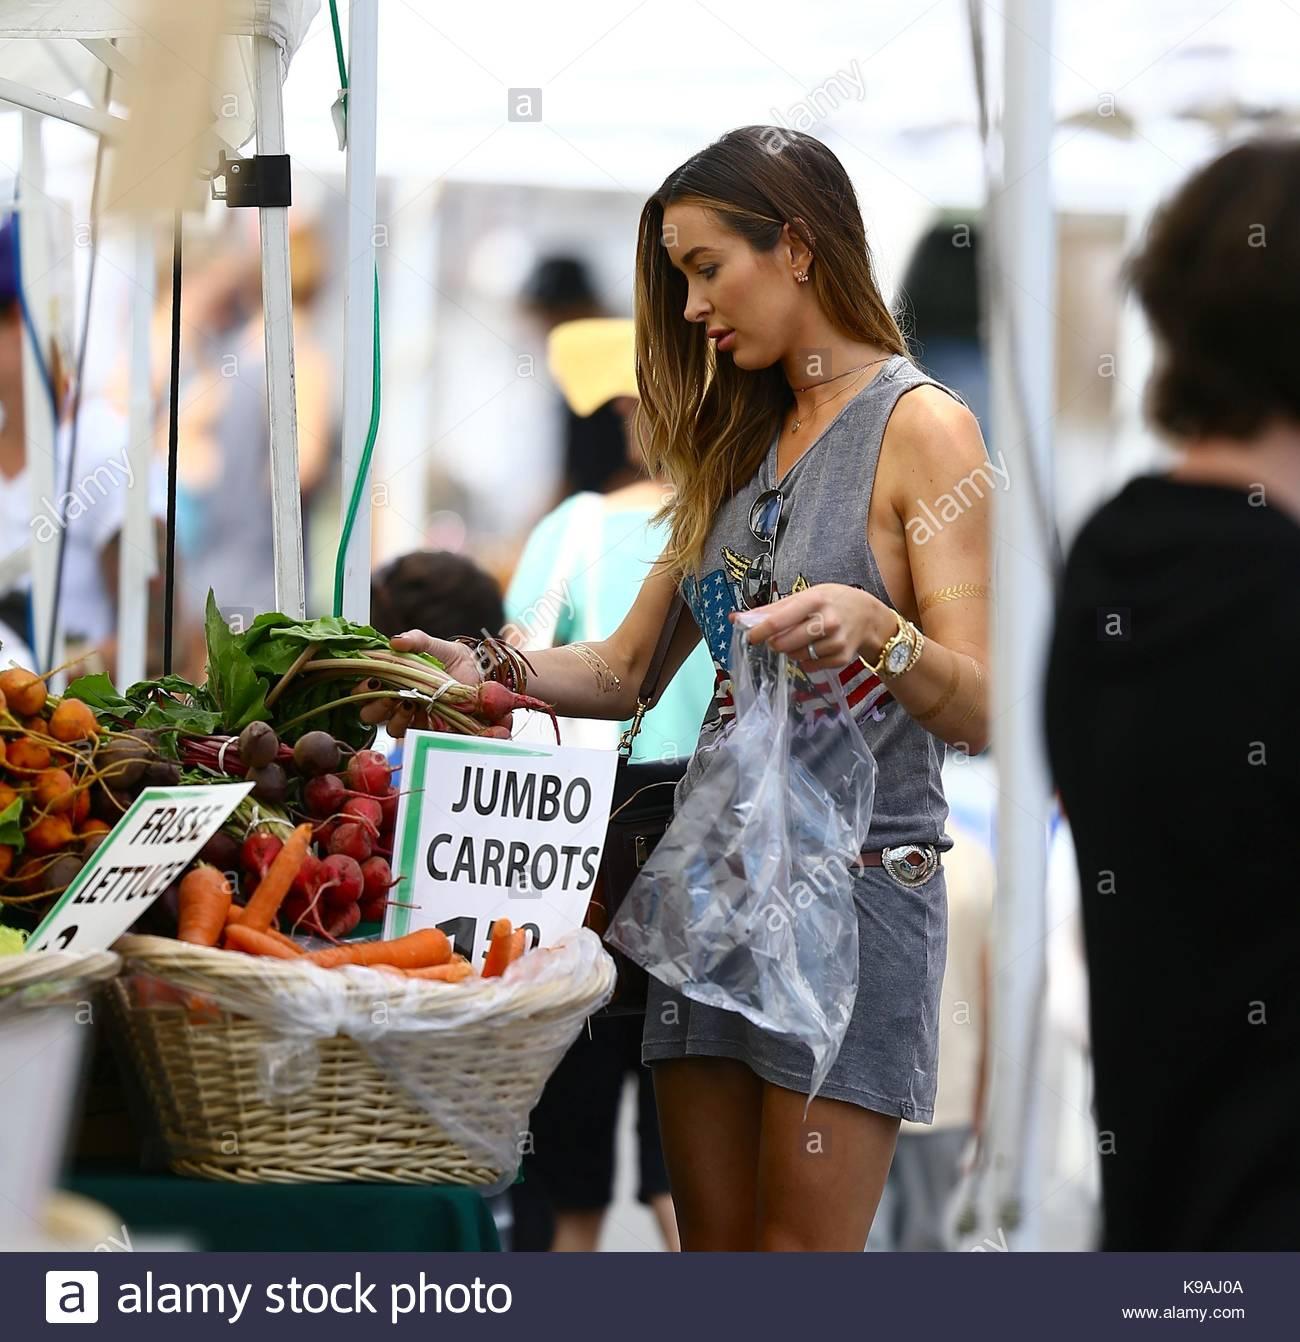 courtney milan unveiled mobilism market - photo#37